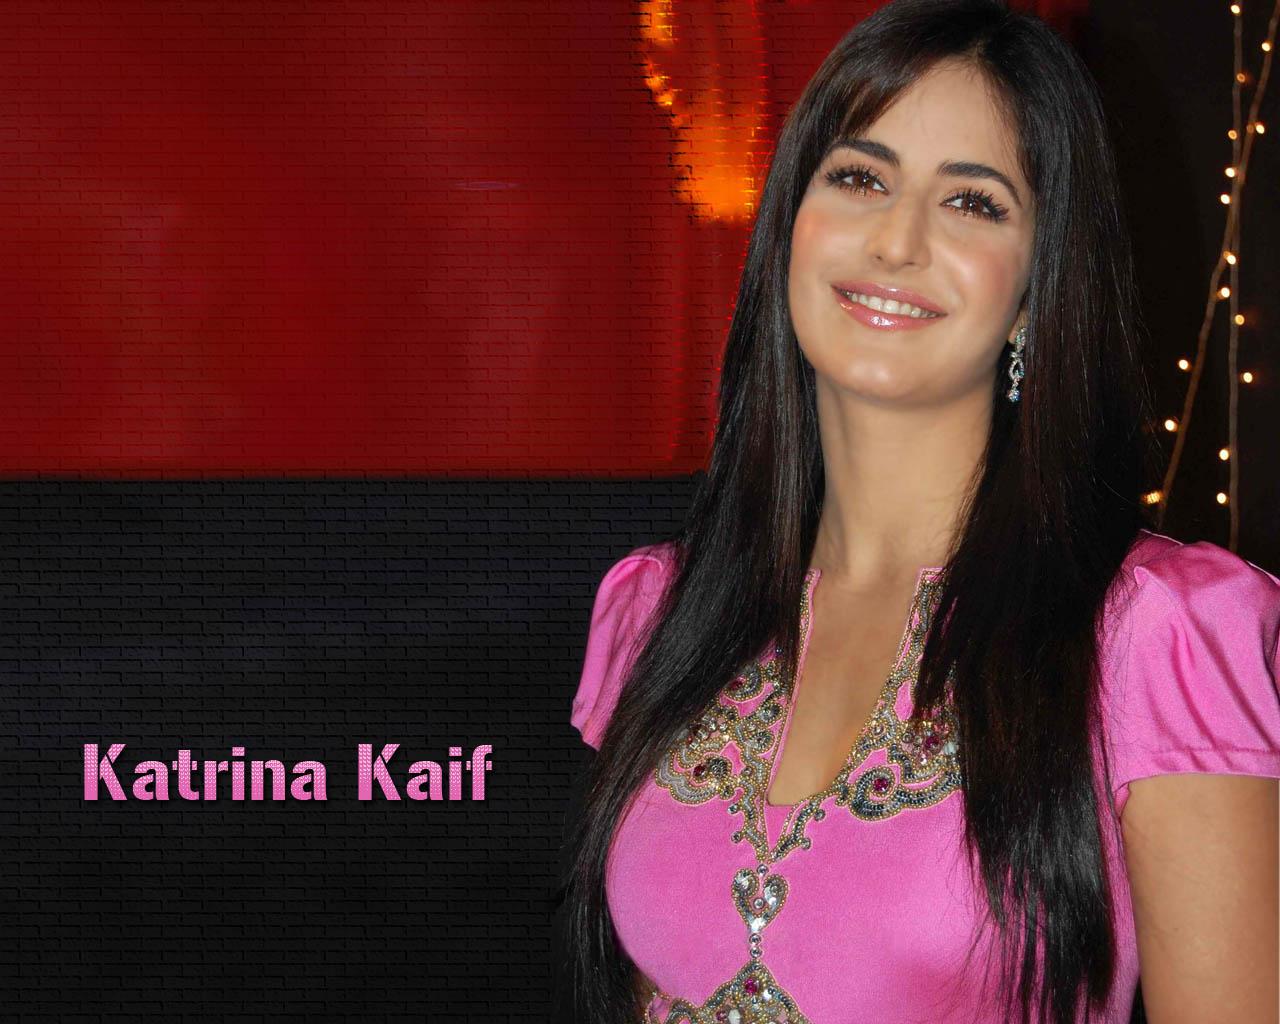 Katrina Kaif Desktop Wallpapers 5 - High Resolution Pictures-5916